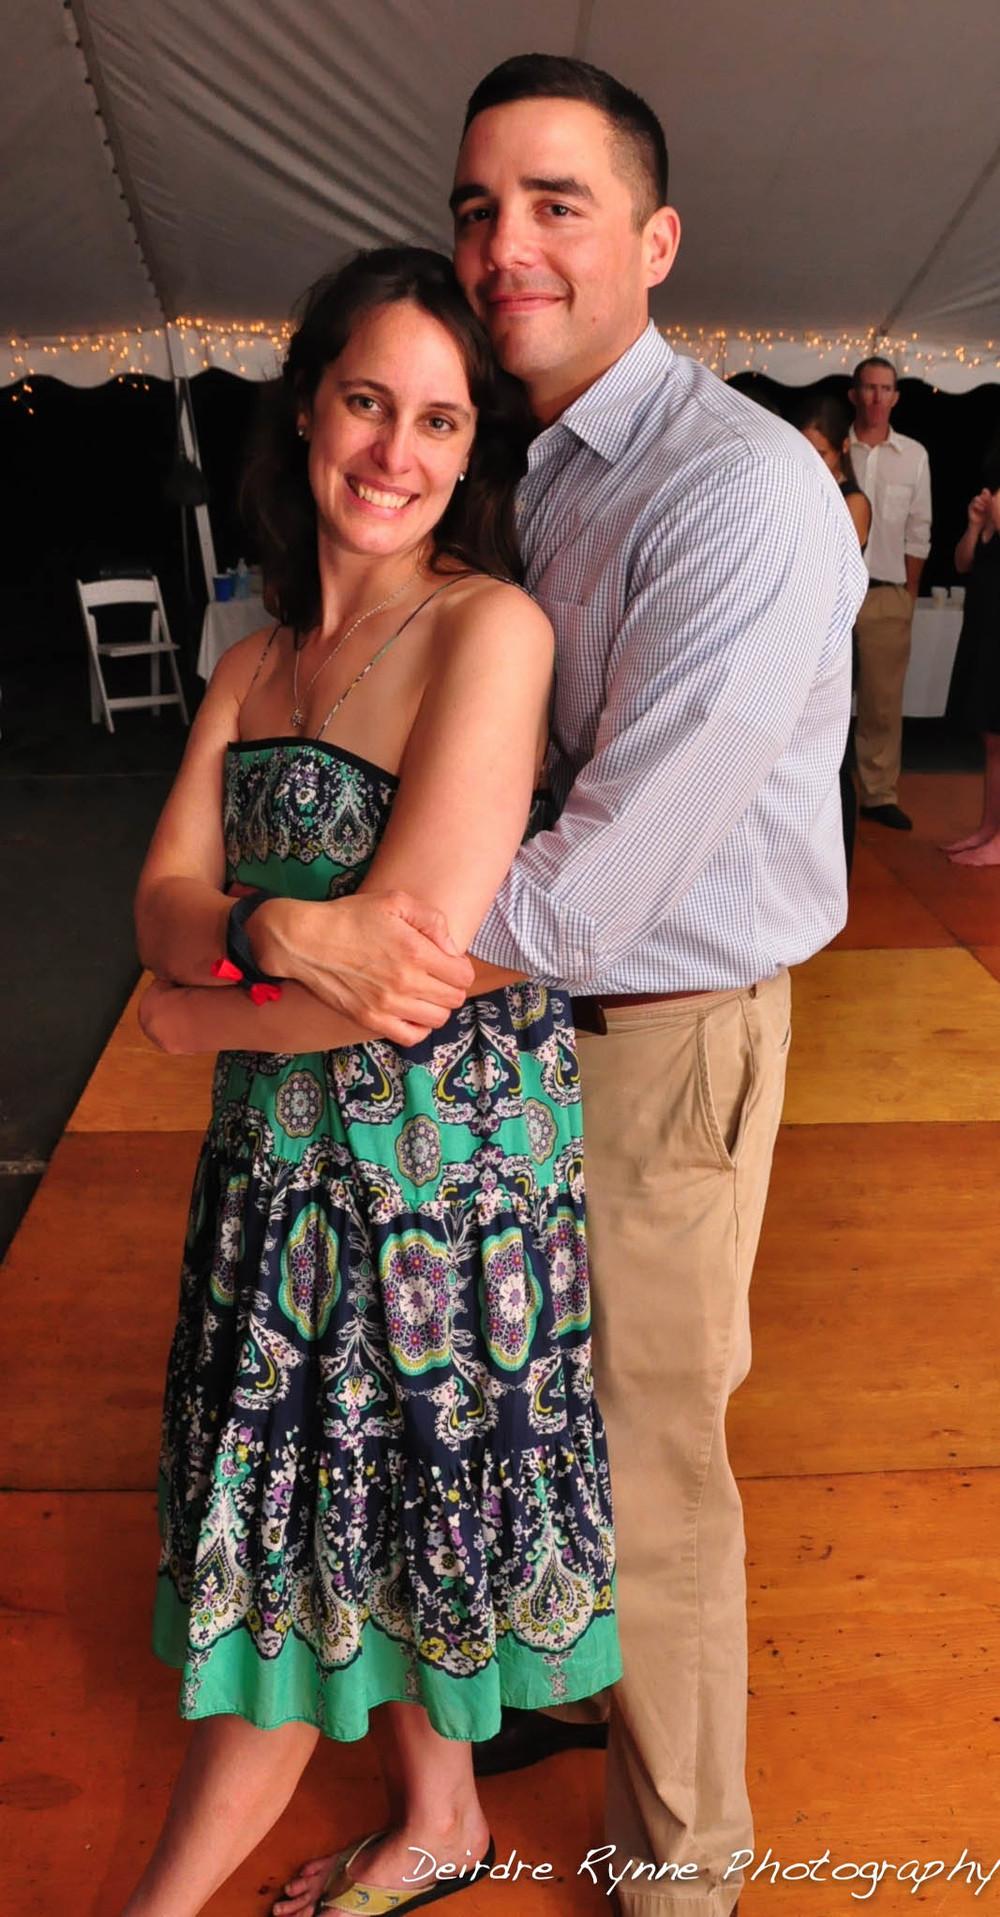 Alyssa & Nate- Farmington, Maine. June 2012.